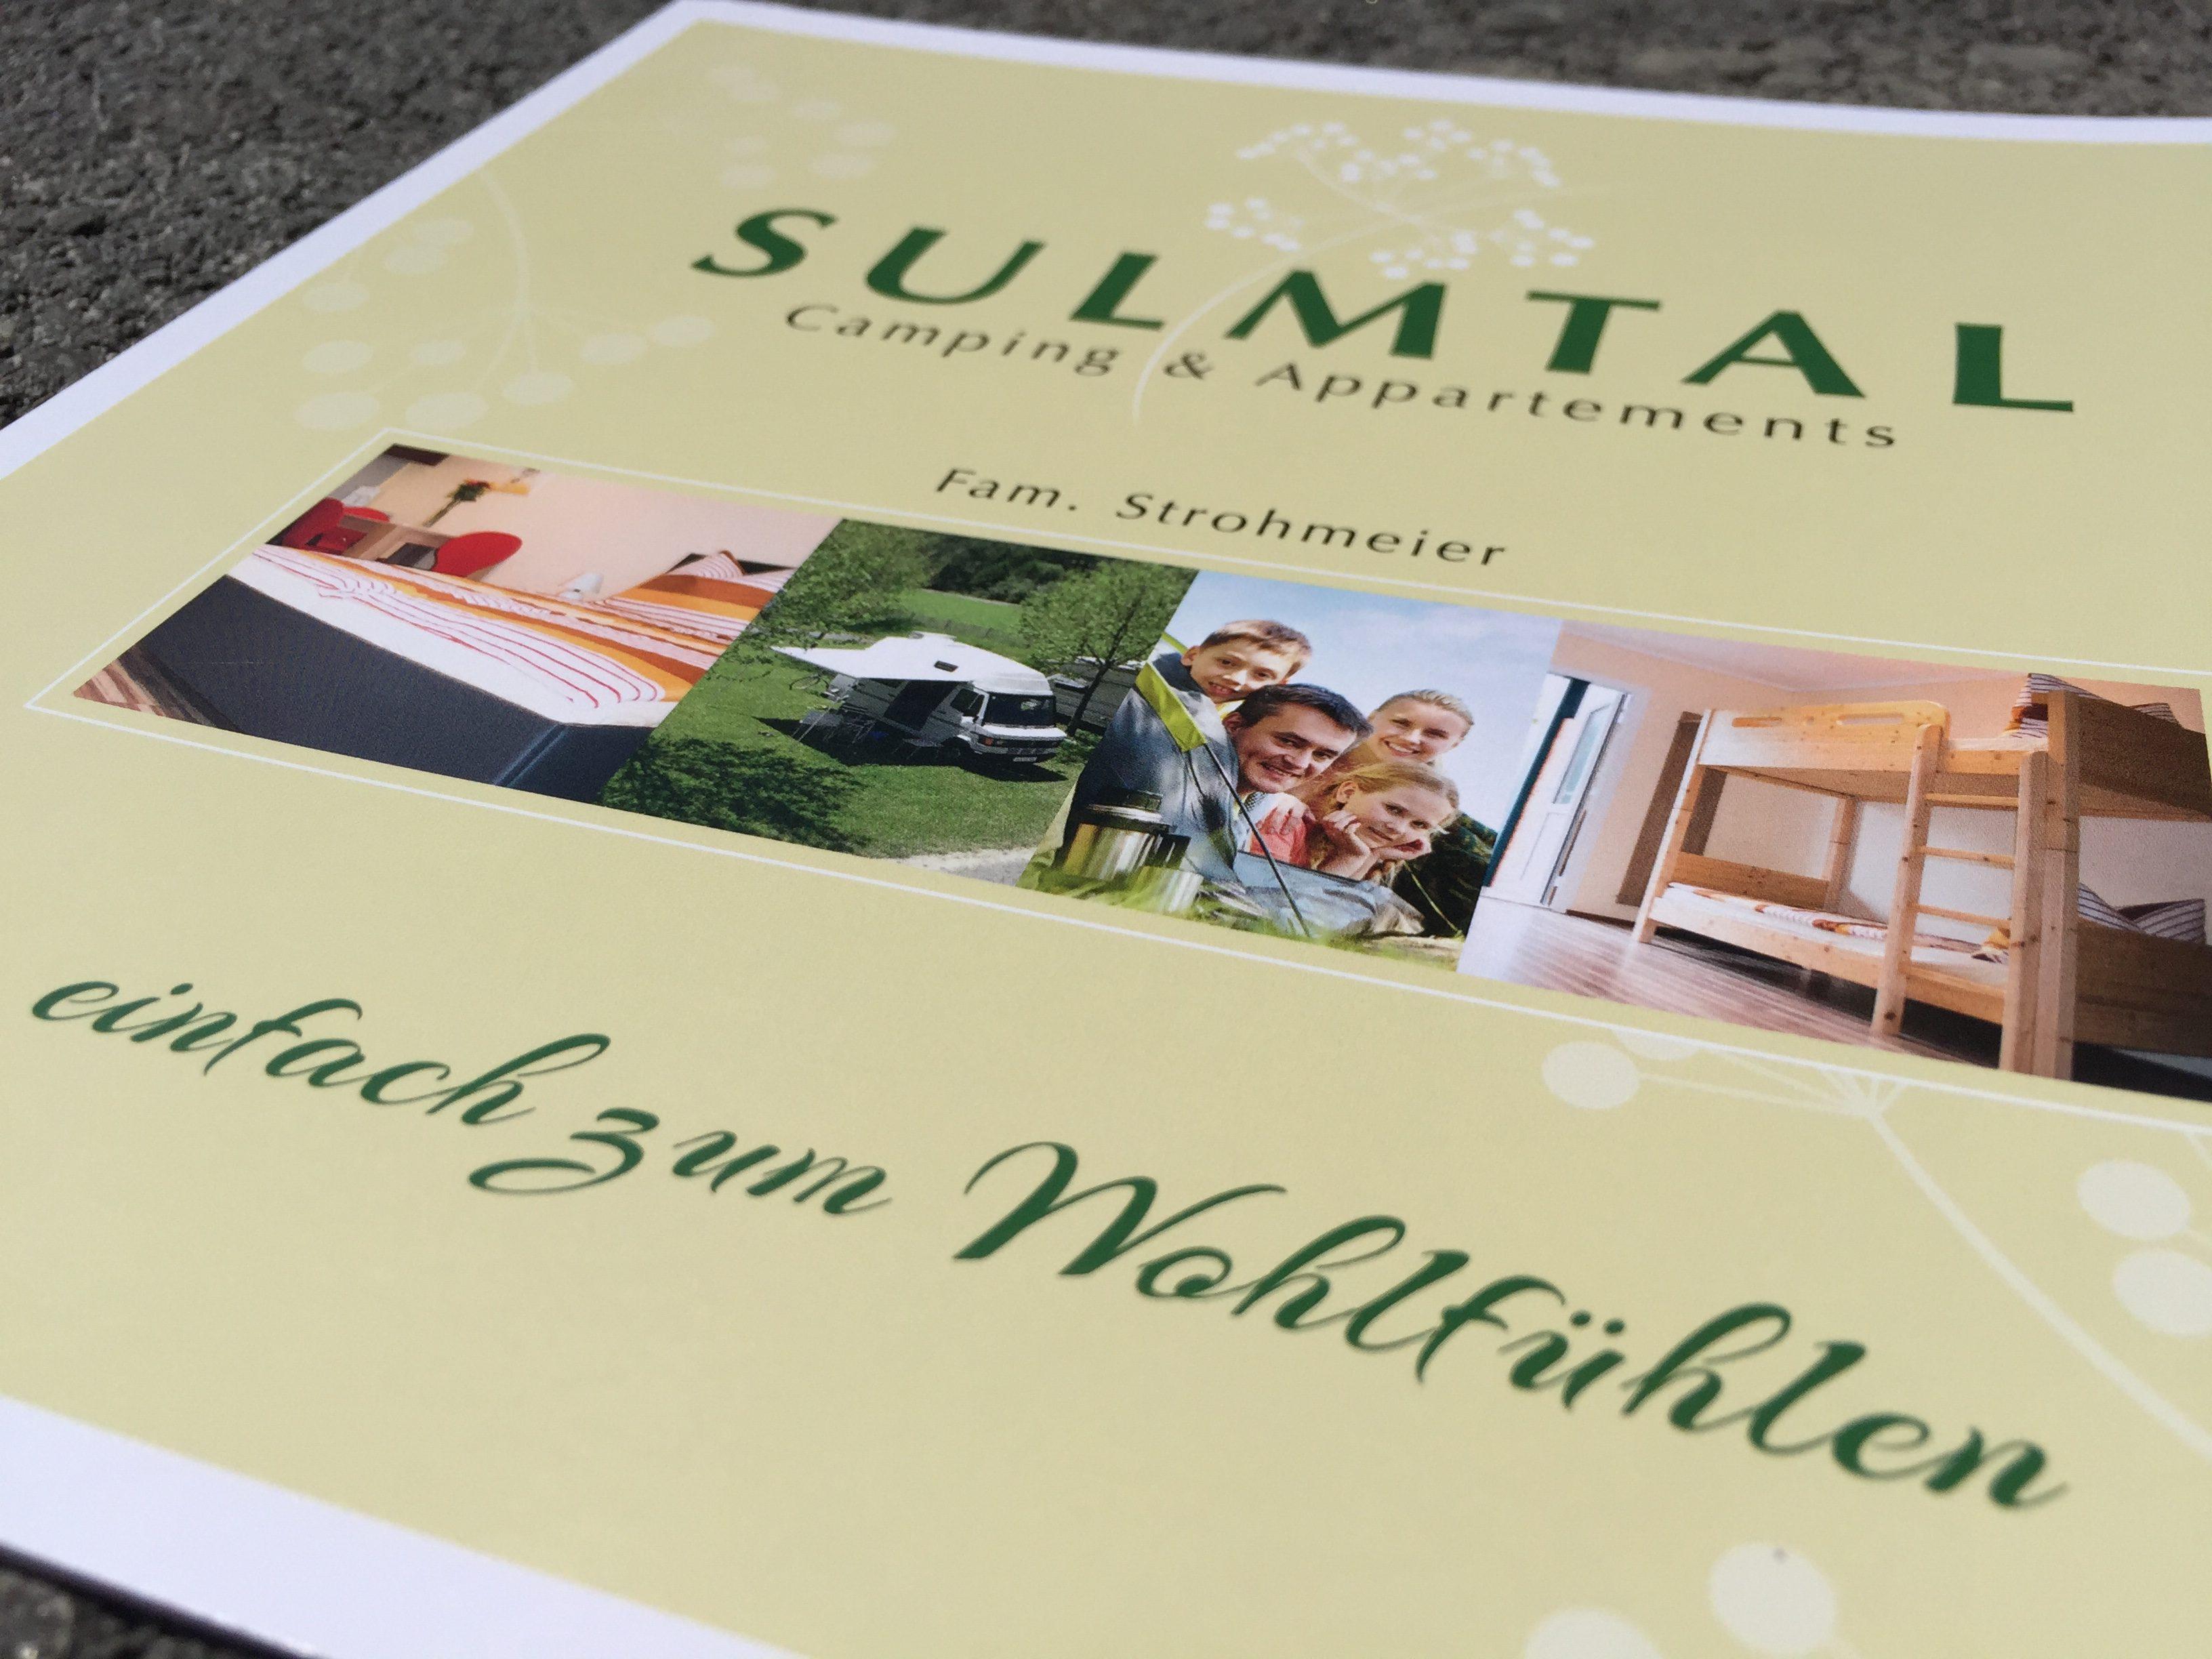 Folder Sulmtalcamping, Camping, Sulmtal